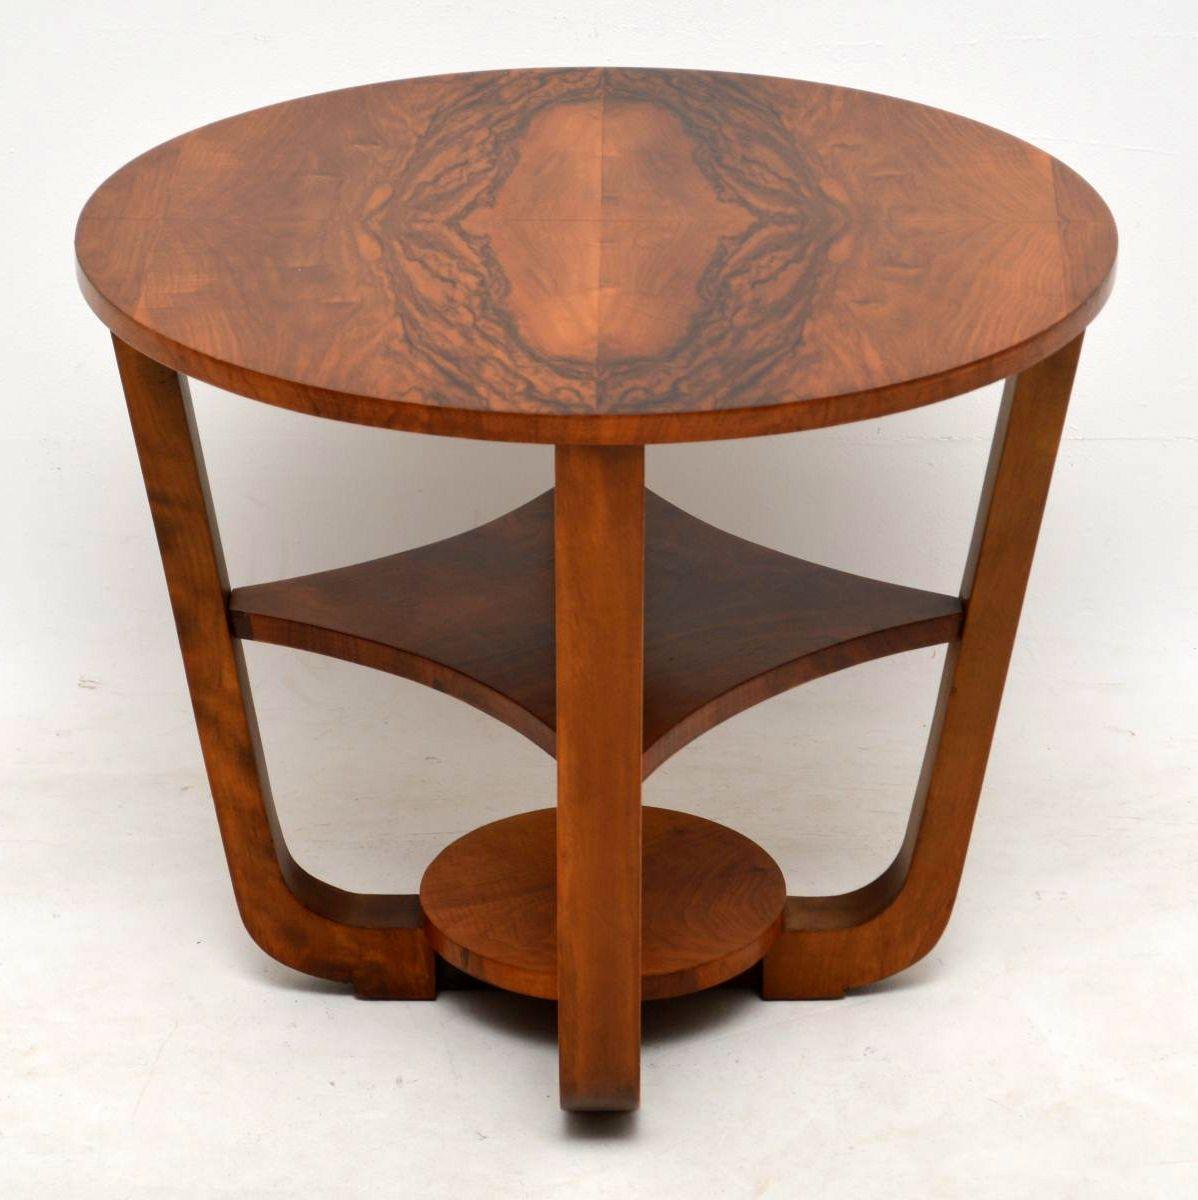 1920's Art Deco Figured Walnut Coffee Table